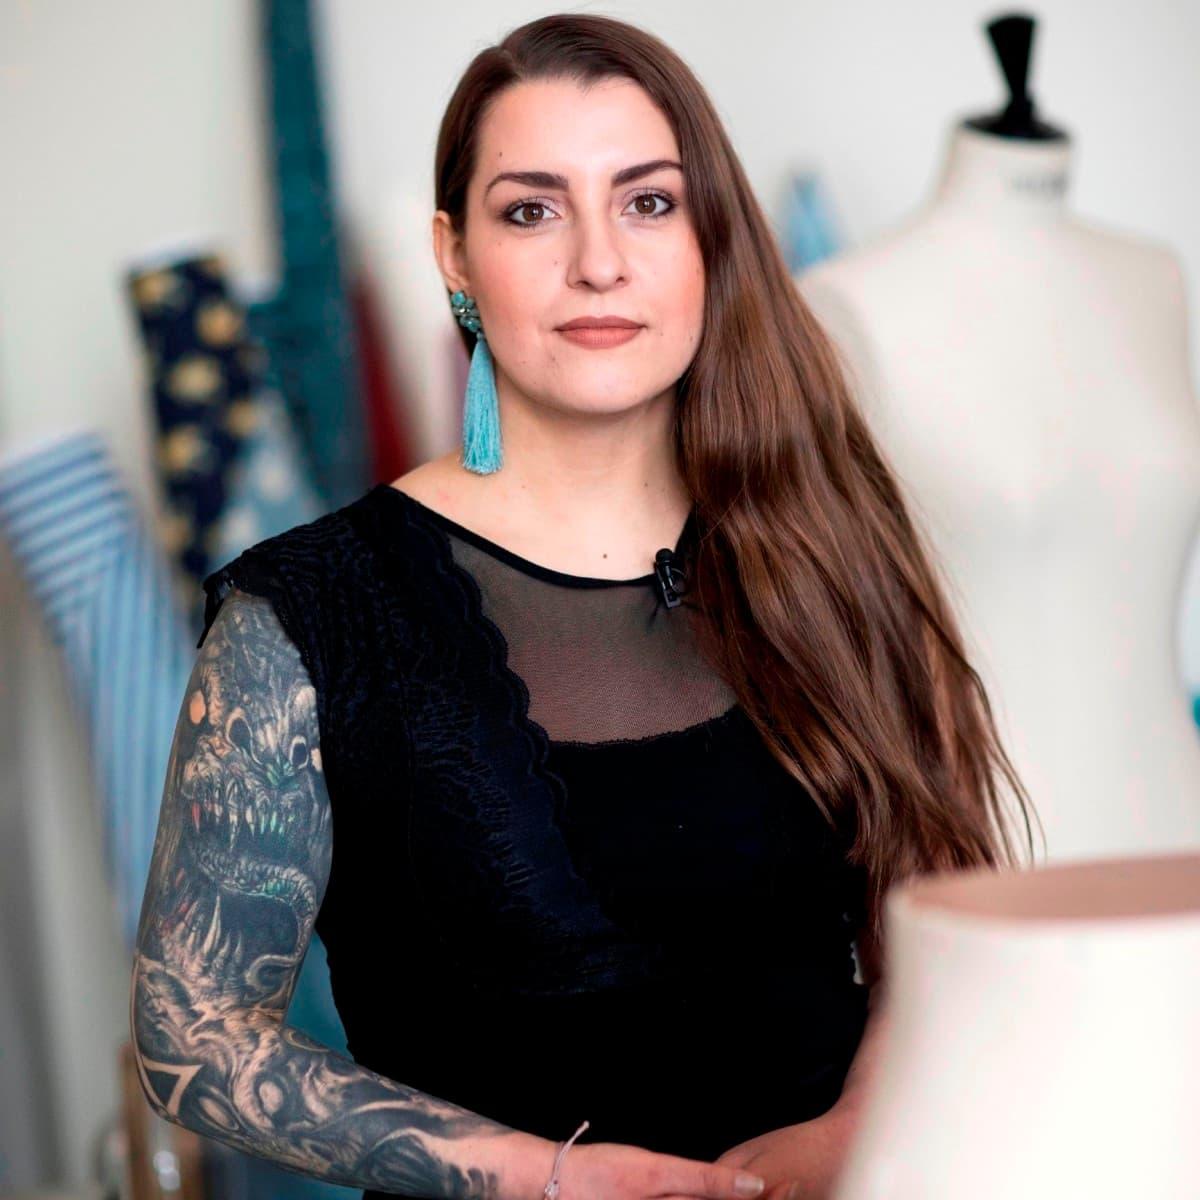 Melanie Lindner - Guidos Masterclass Kandidatin 2019